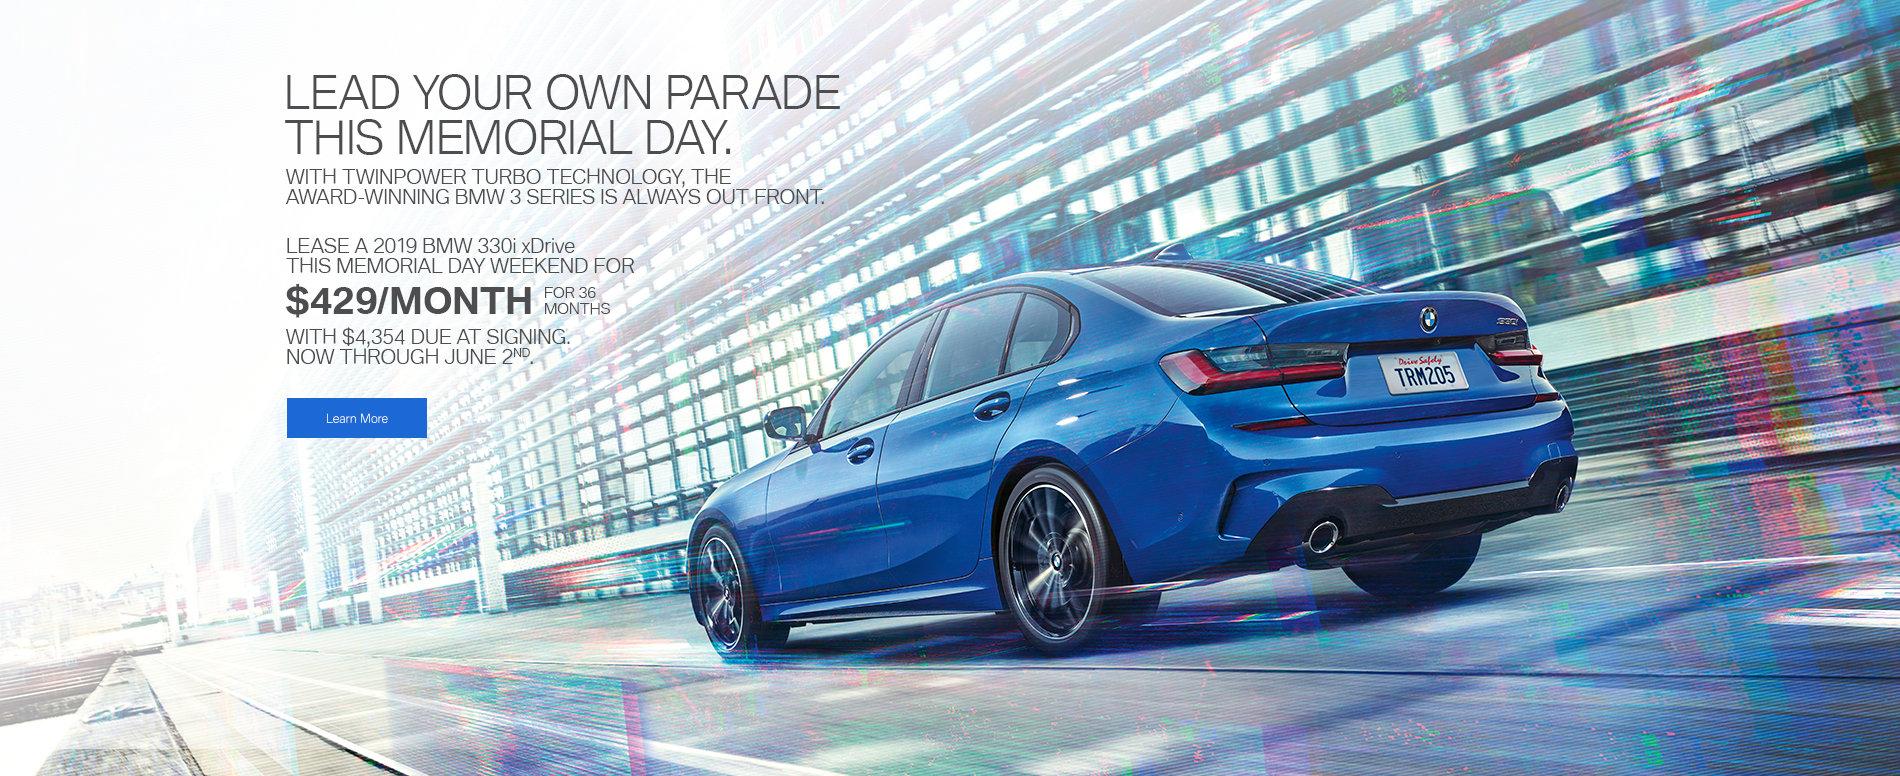 2019 BMW 3 series Memorial Day